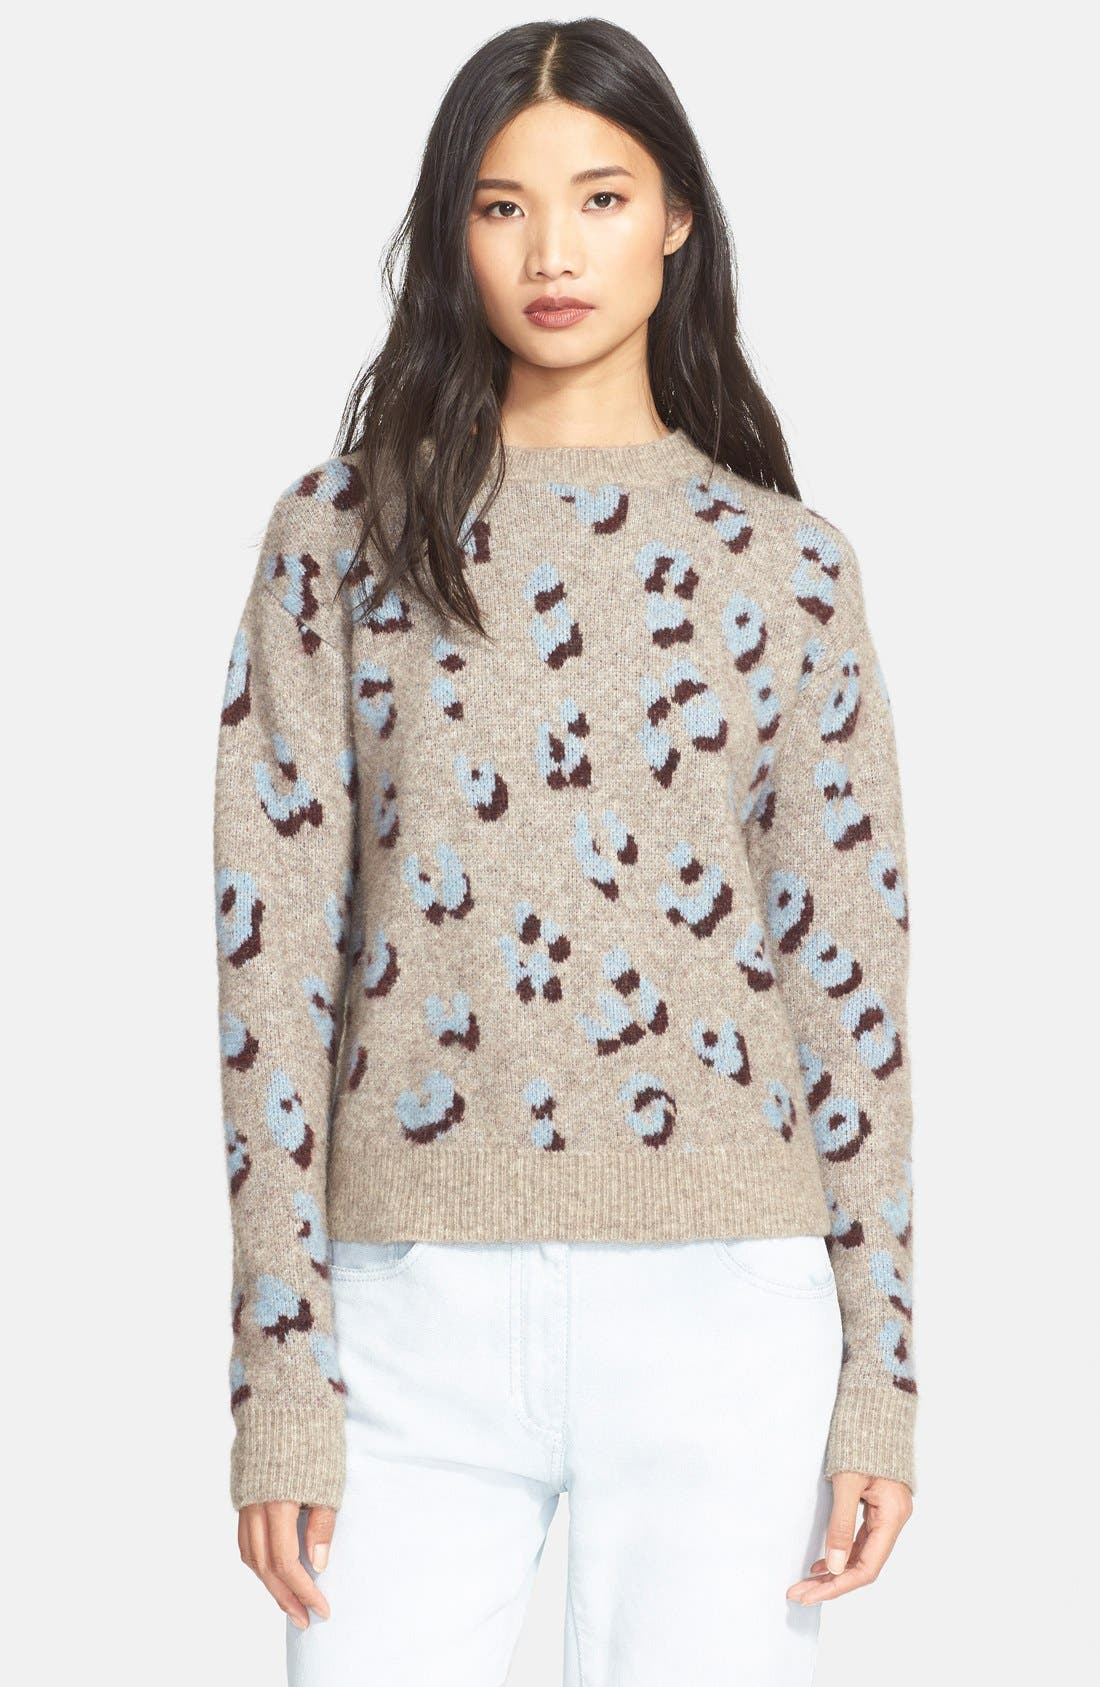 Alternate Image 1 Selected - 3.1 Phillip Lim Leopard Jacquard Sweater